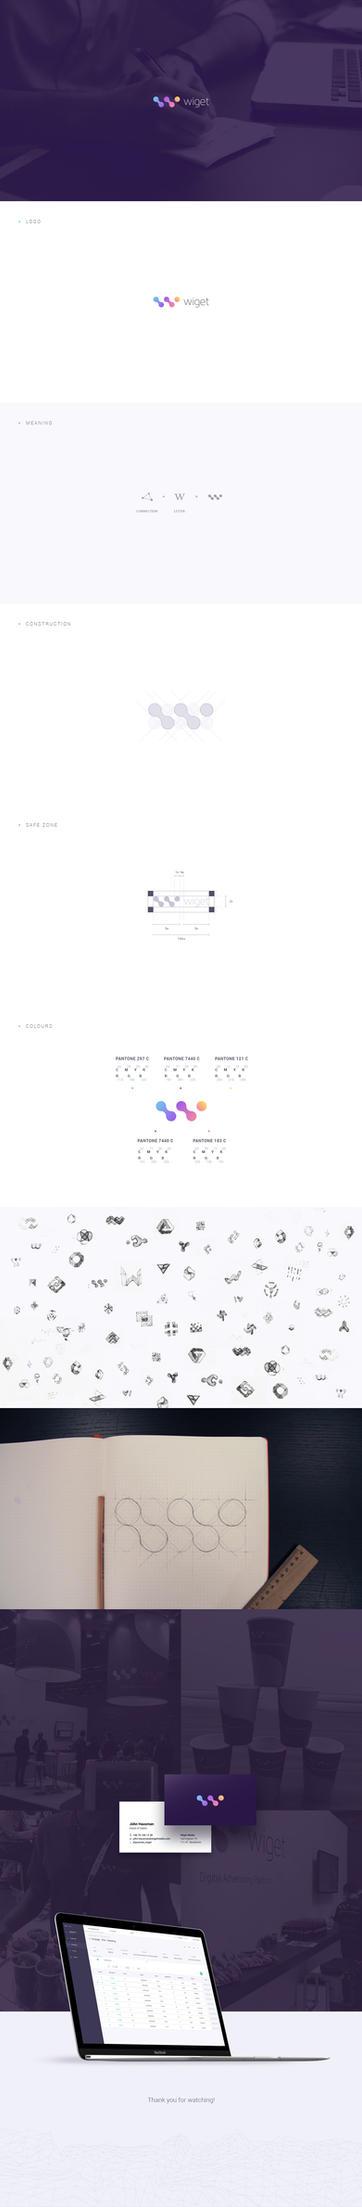 Wiget Media - Brand Identity by Bob-Project